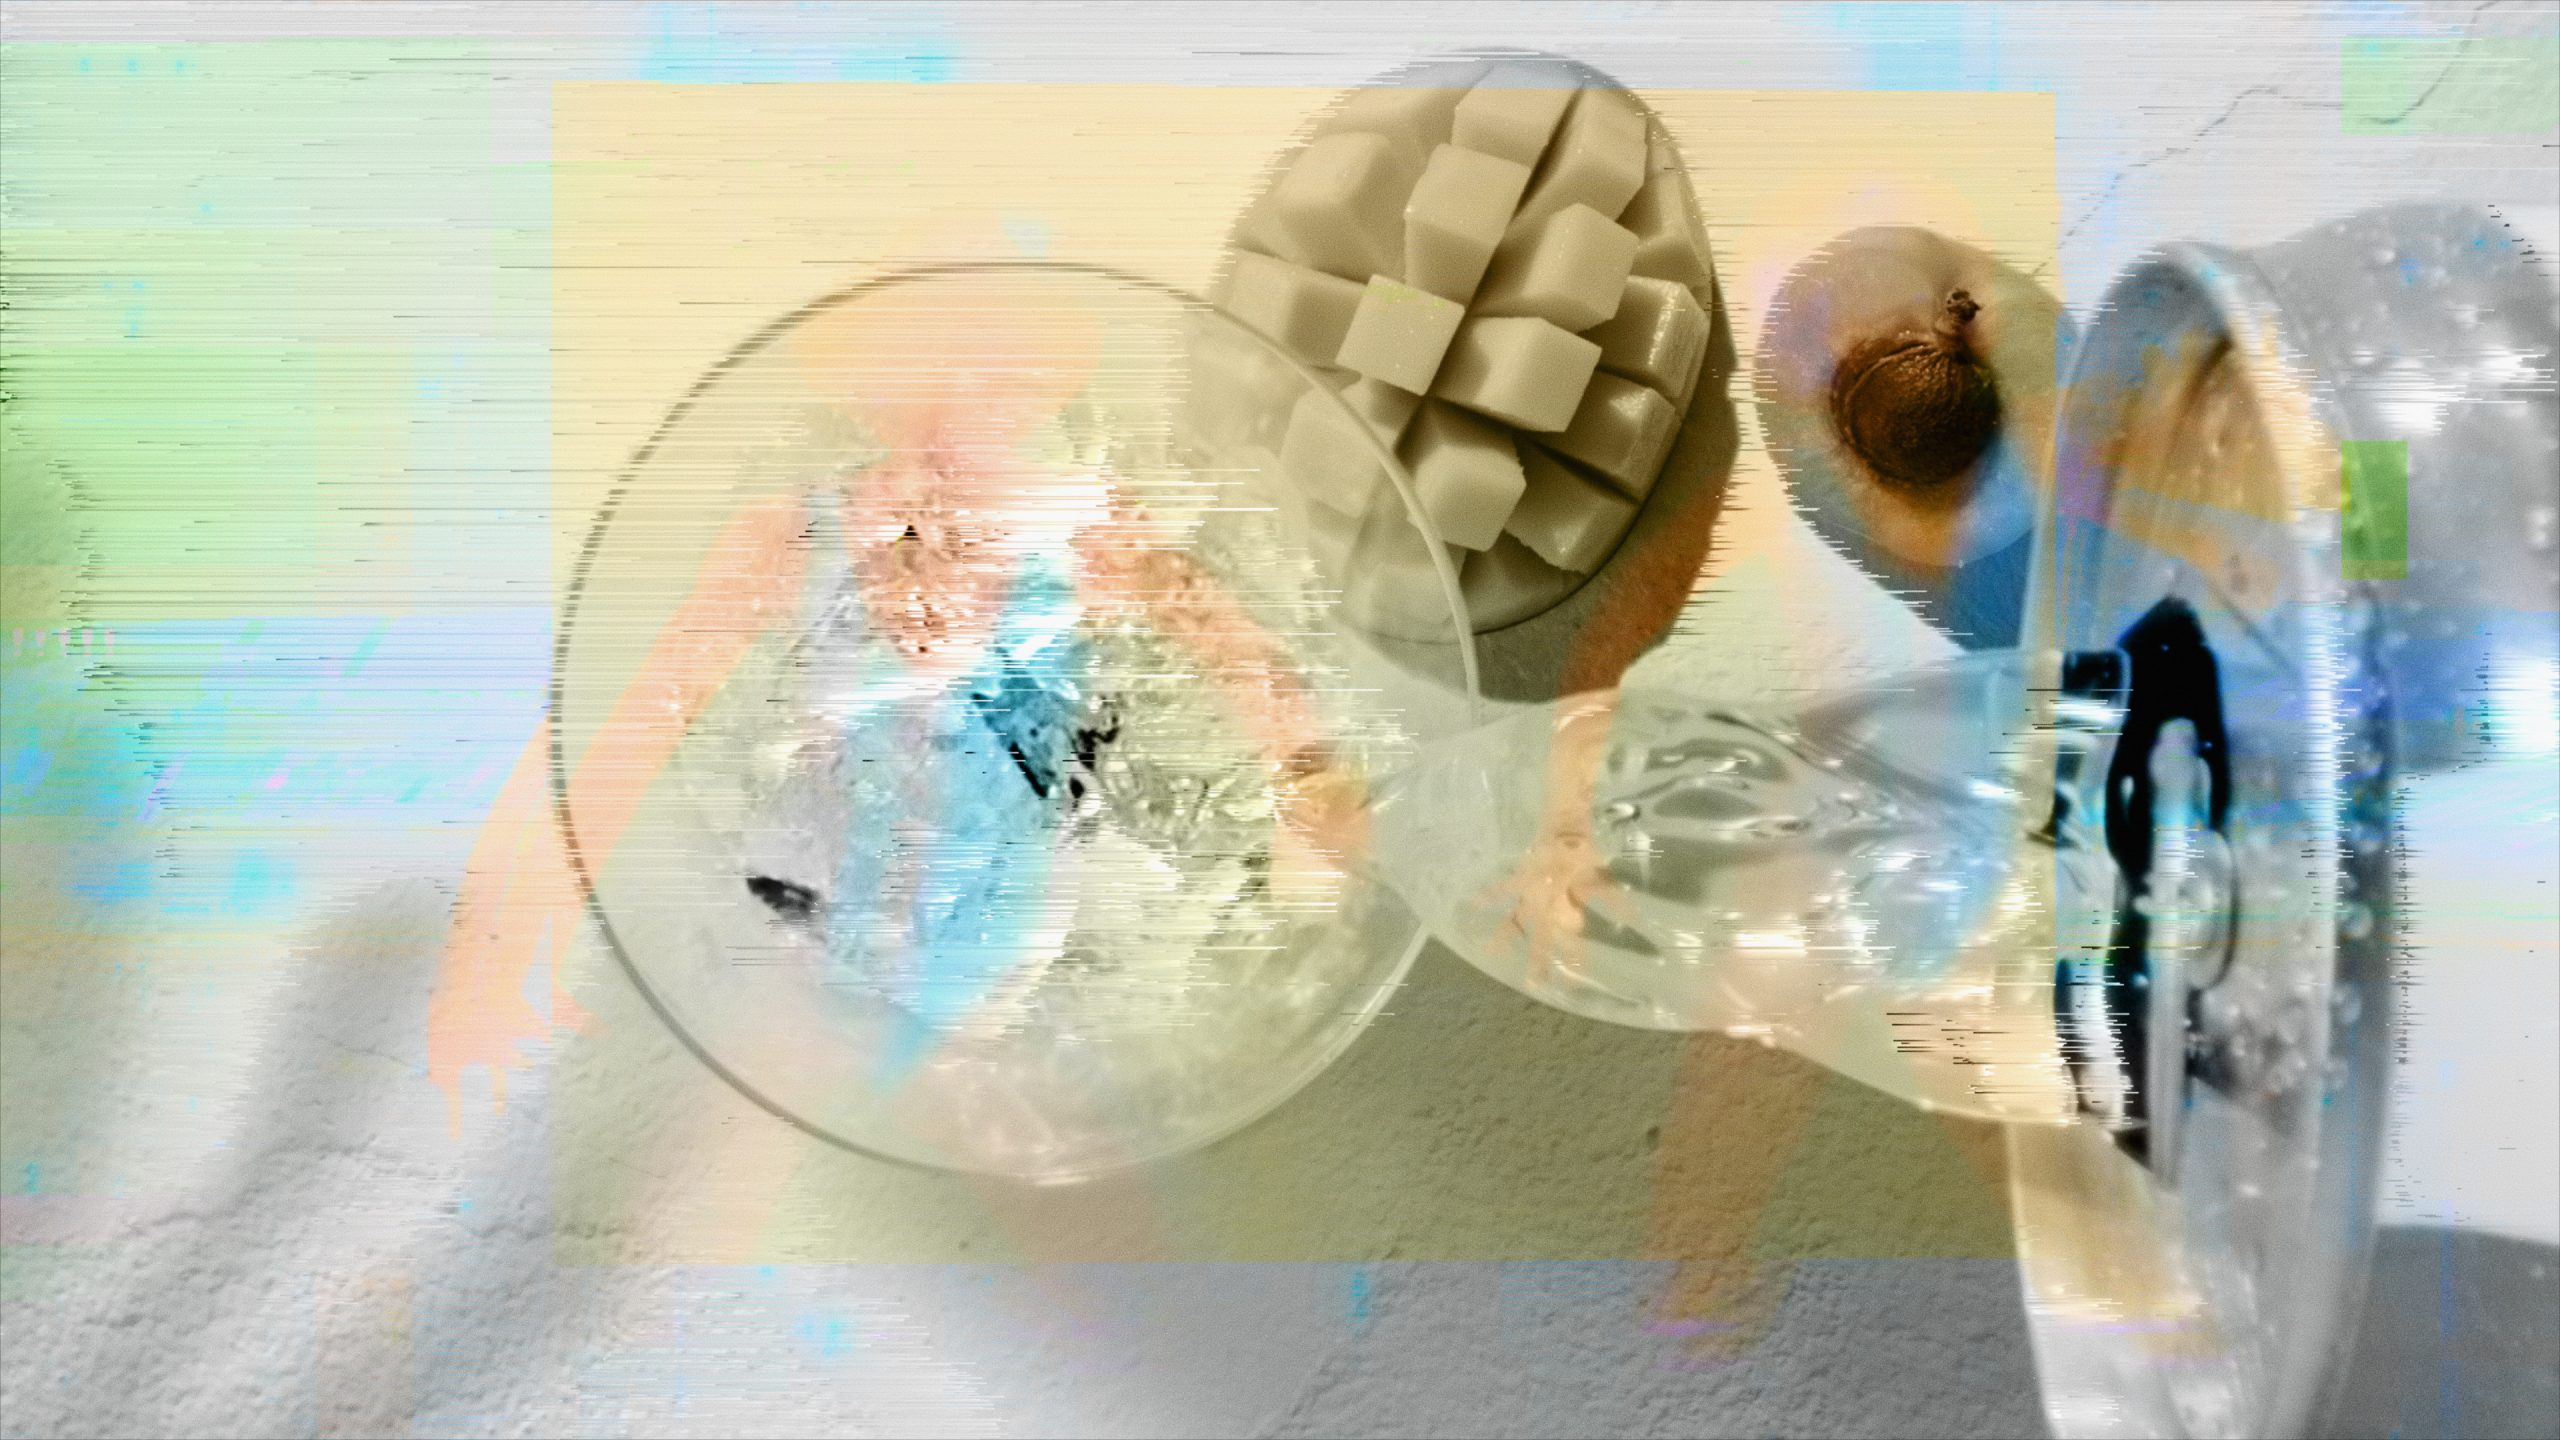 Michelob_EDIT_4K (0-00-03-07)